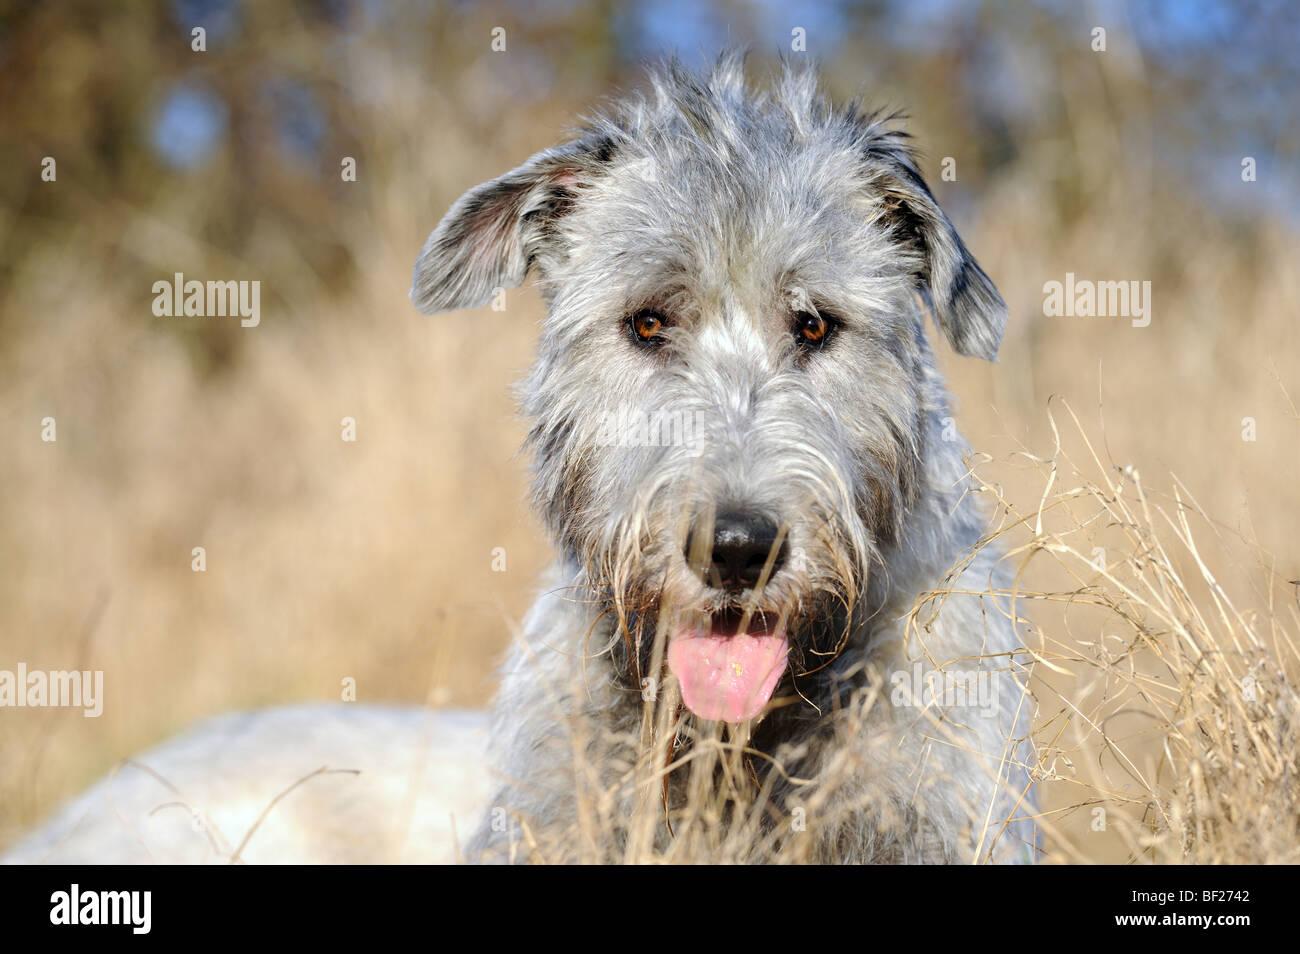 Irish Wolfhound (Canis lupus familiaris), portrait of adult. Stock Photo